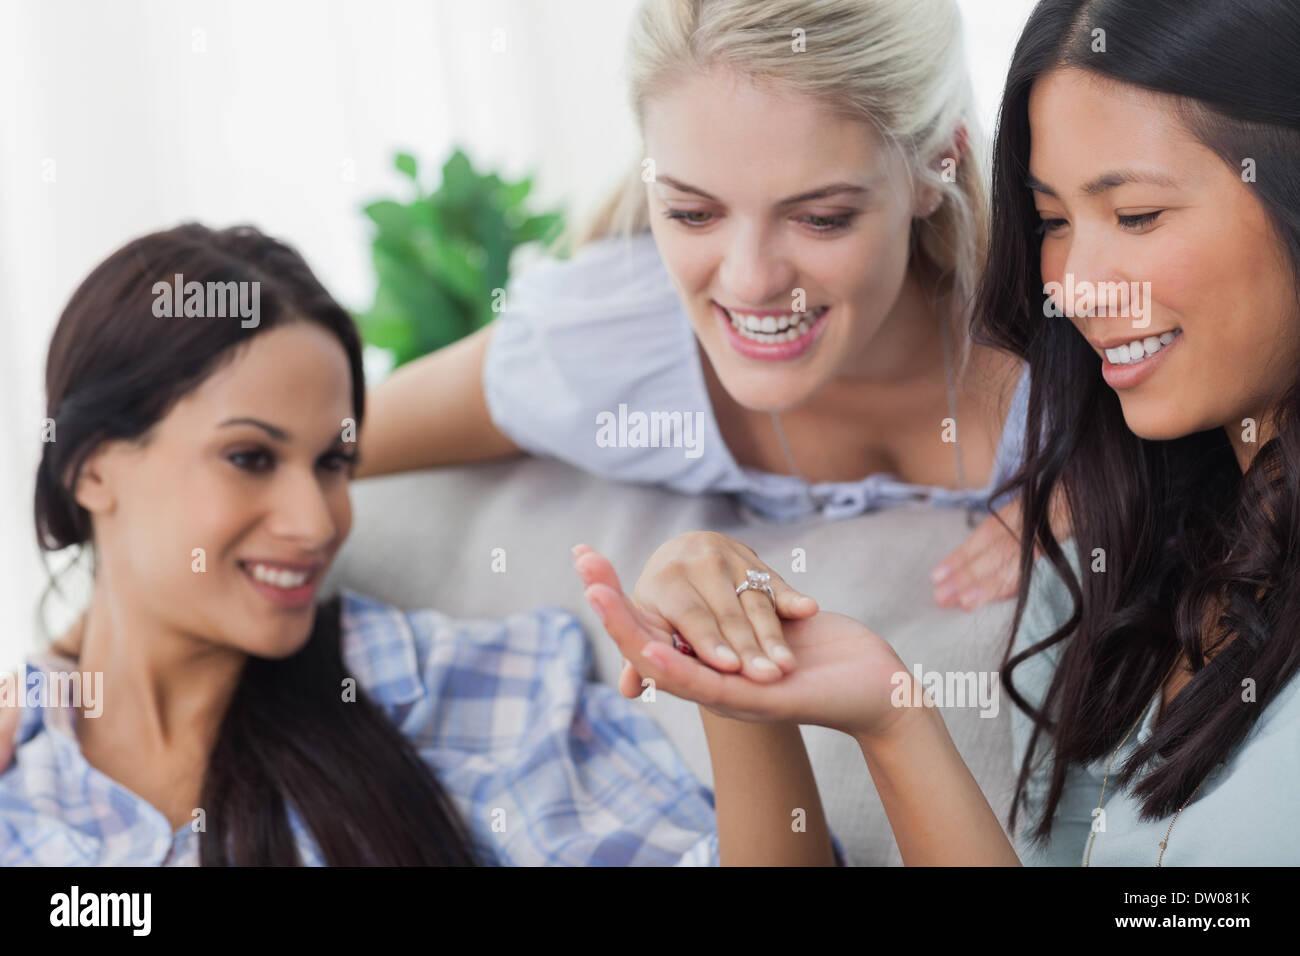 Friends admiring brunettes engagement ring - Stock Image